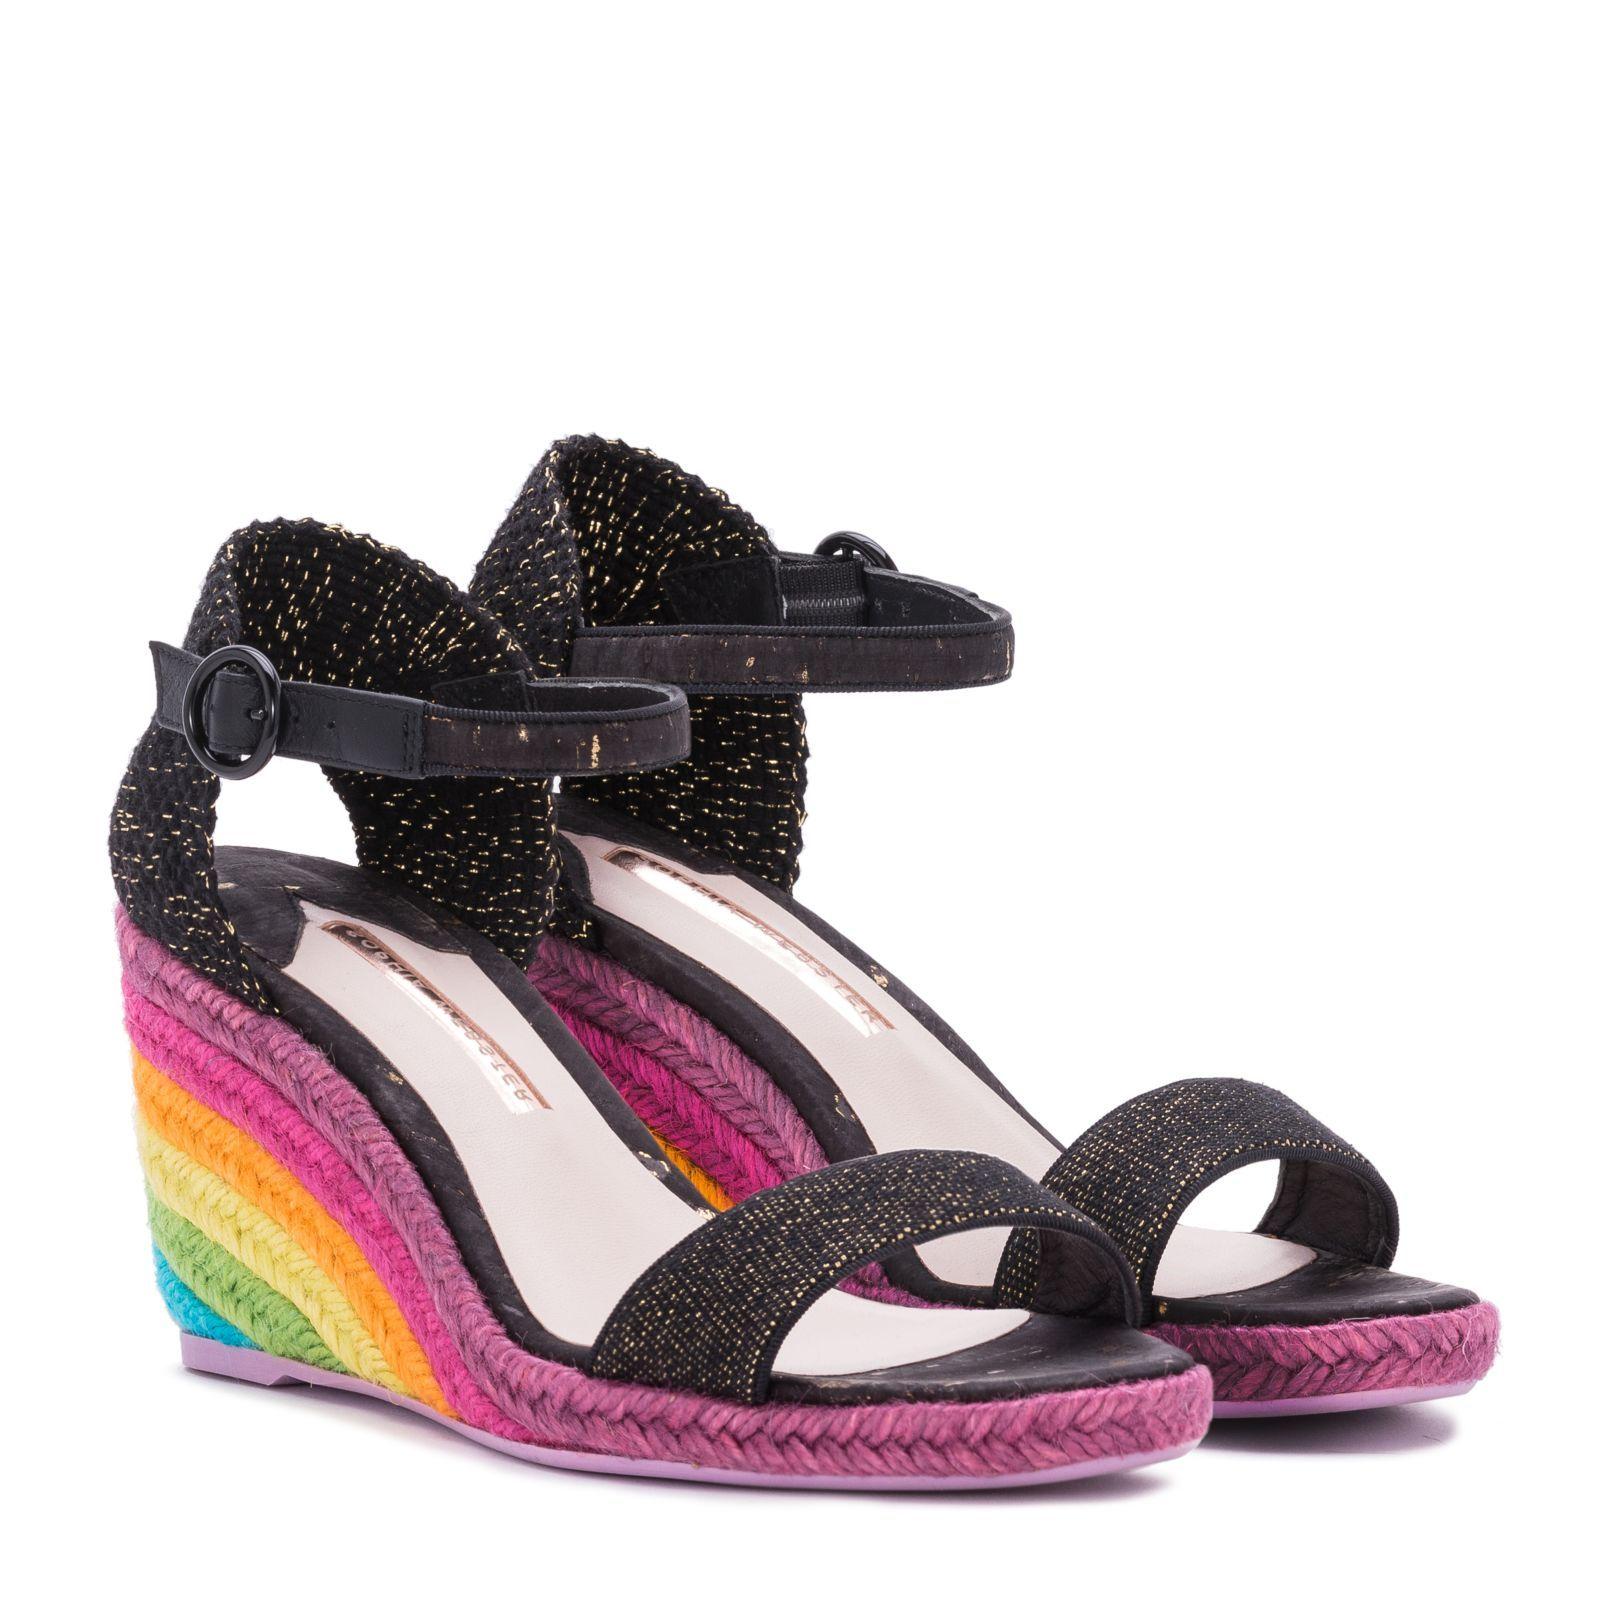 3fcb0e32125 Lucita 90mm - All Shoes - Sophia Webster